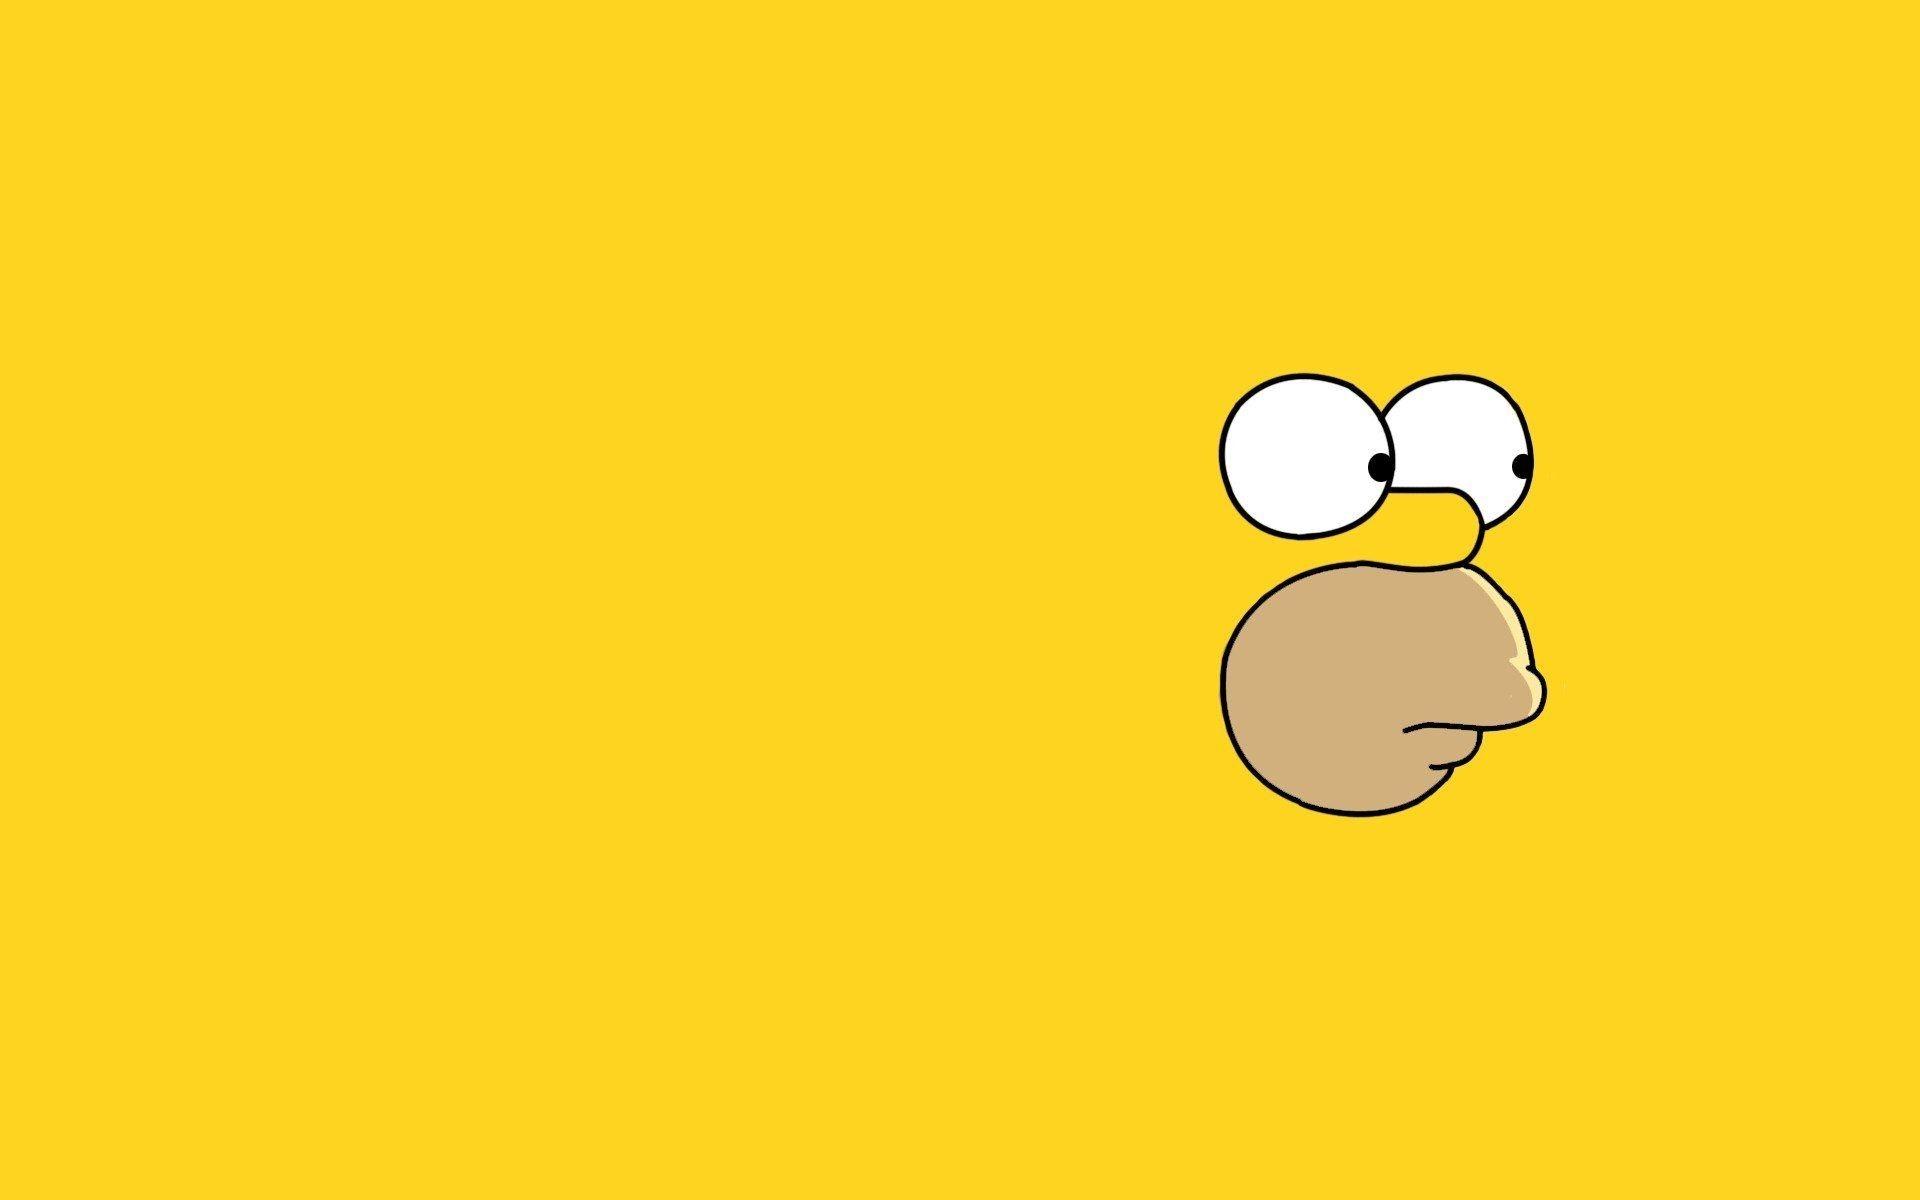 Simpsons Background